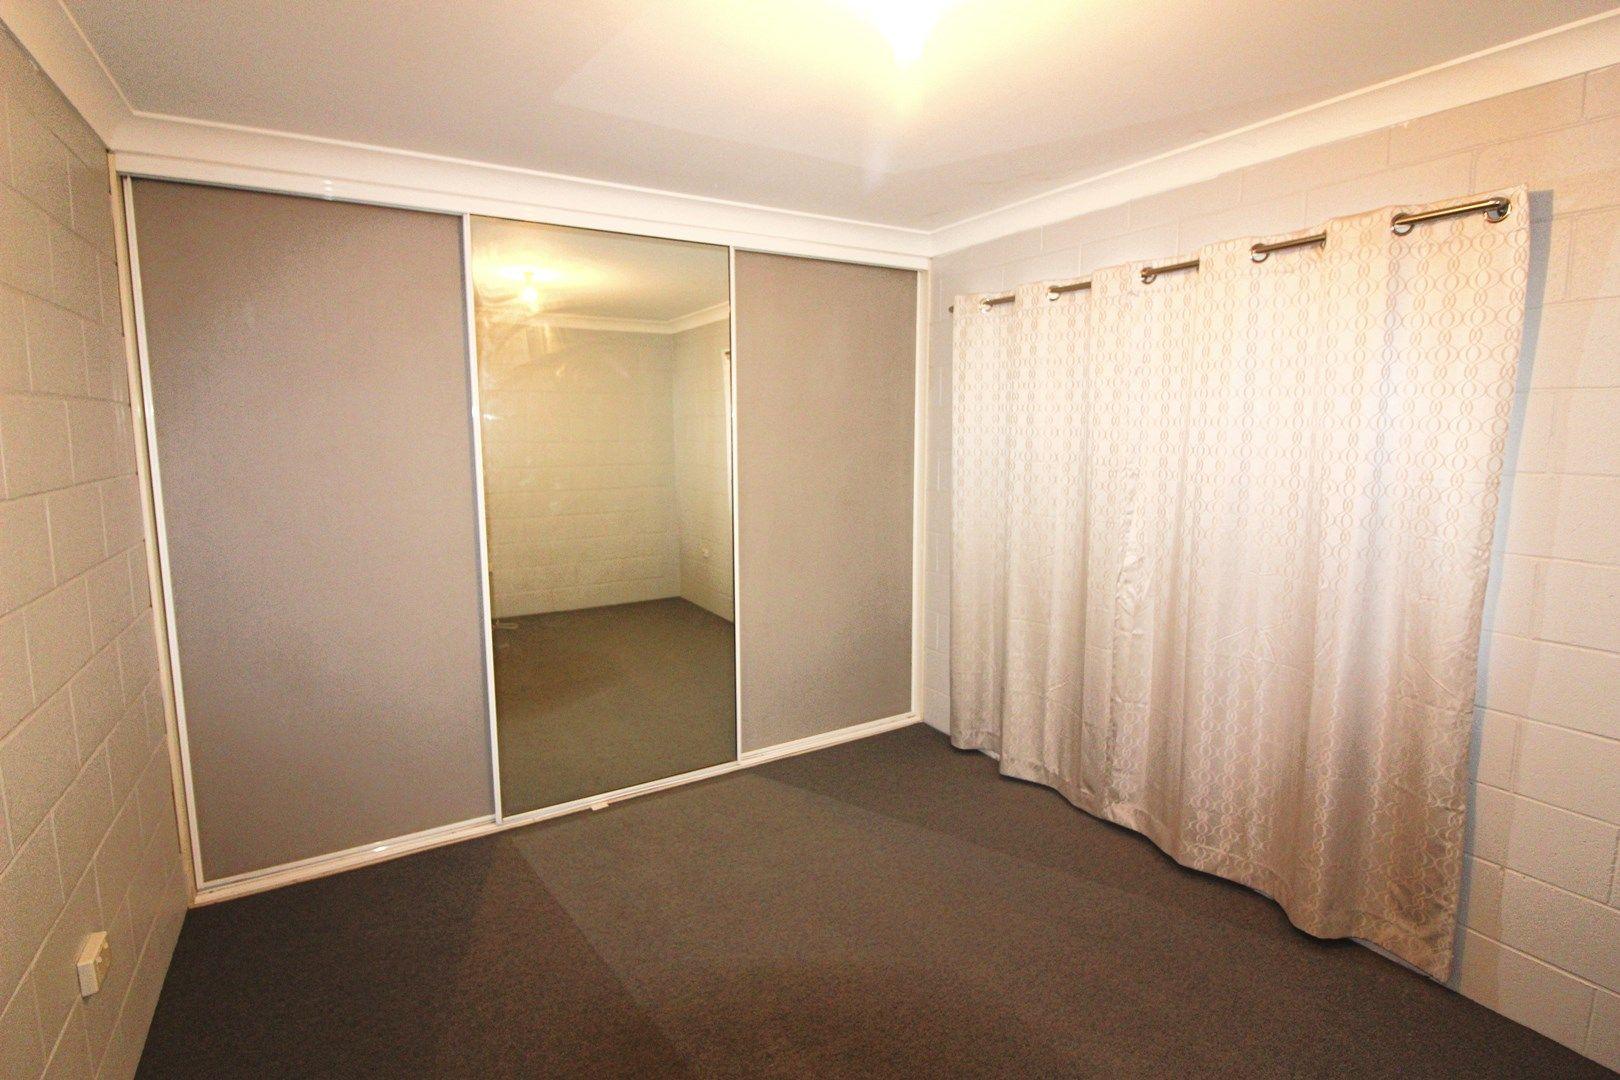 Unit 2/21 Duchess Rd, Mount Isa QLD 4825, Image 0